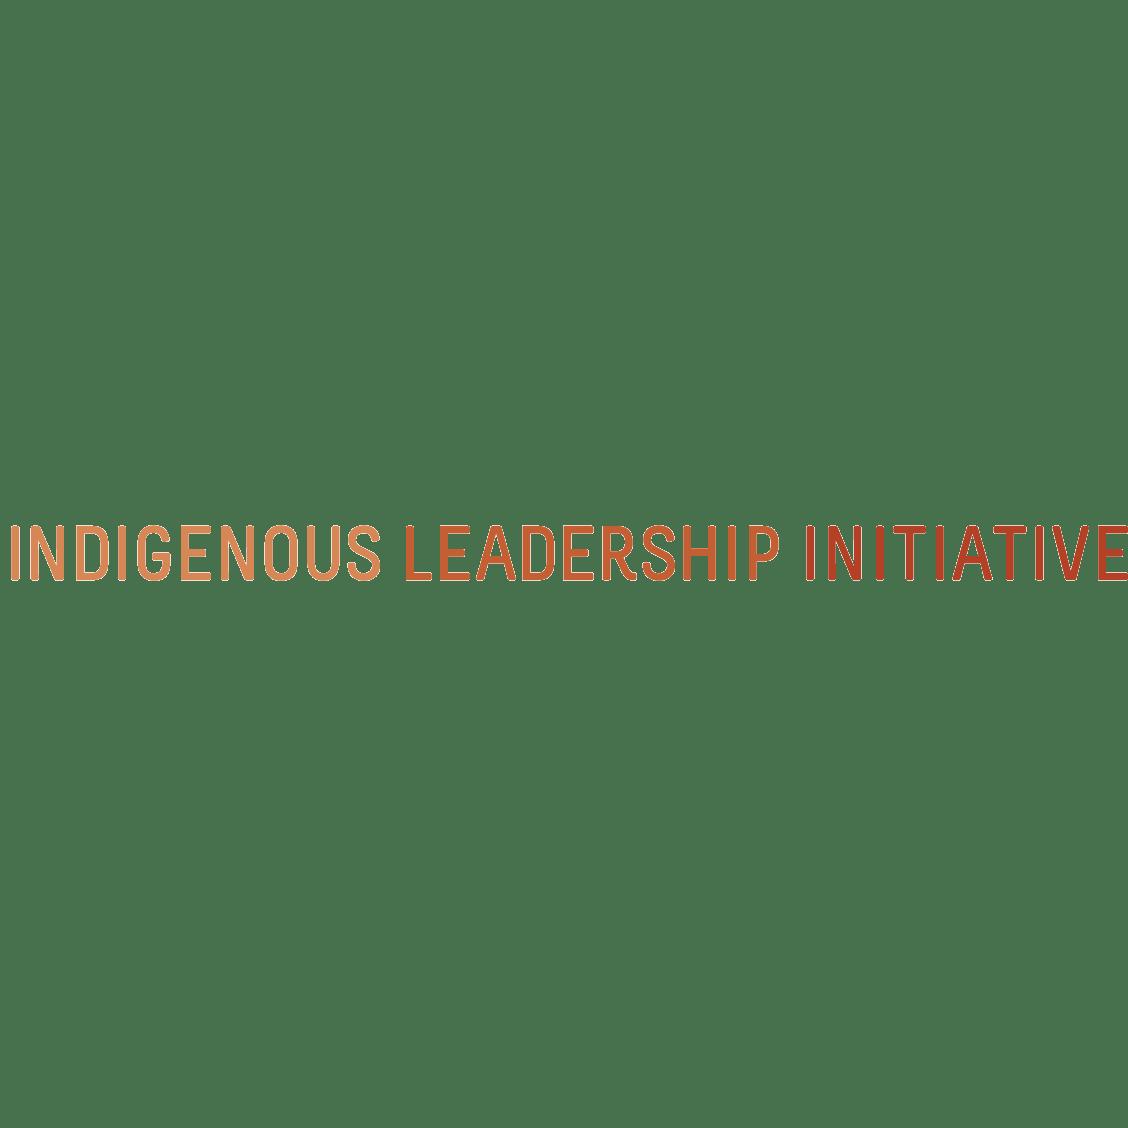 Indigenous Leadership Initiative